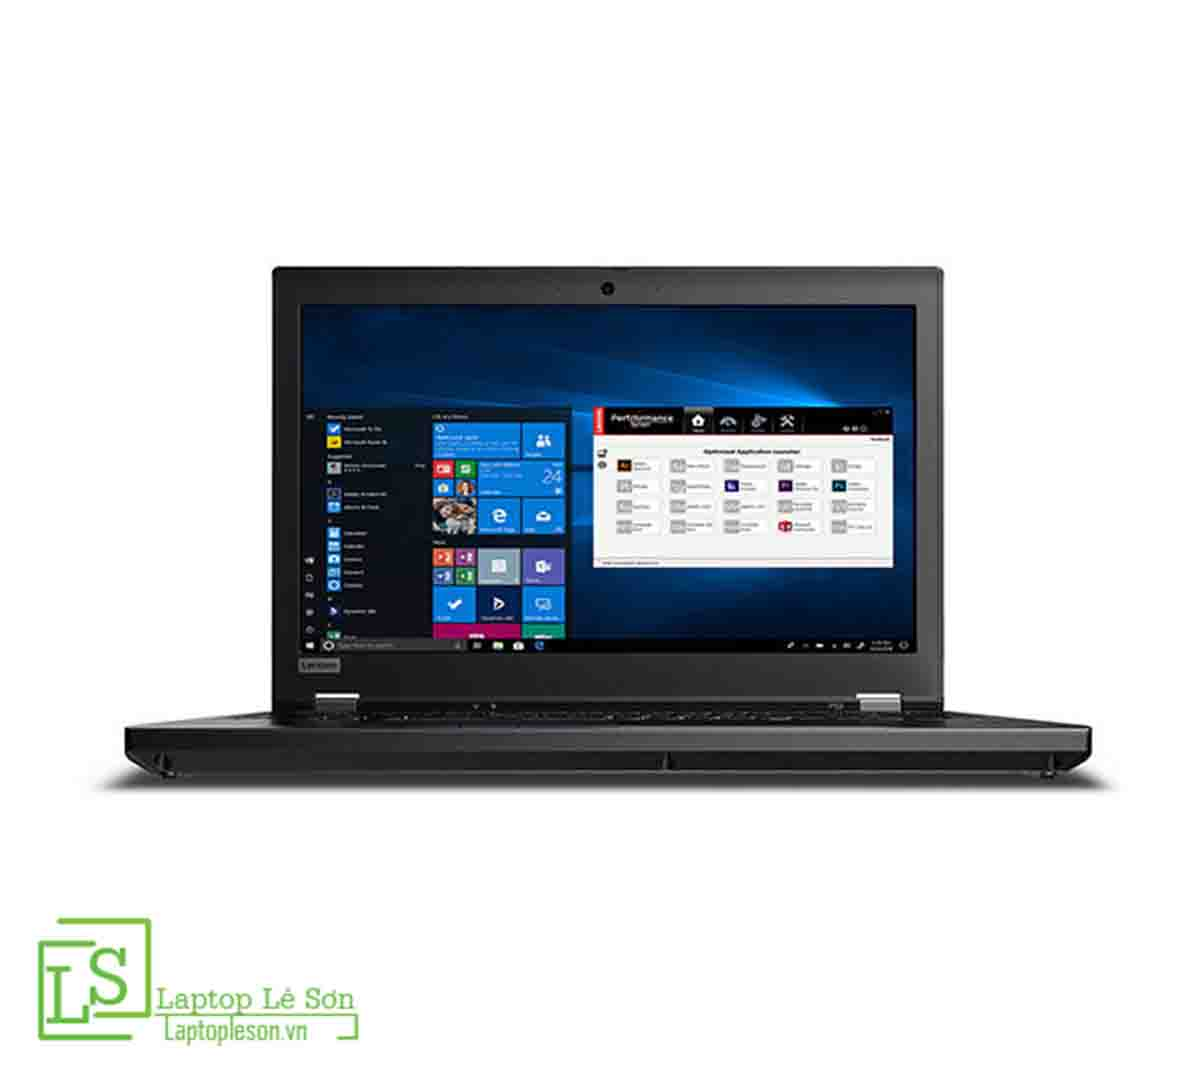 Lenovo Thinkpad P53 Laptop Lê Sơn 05